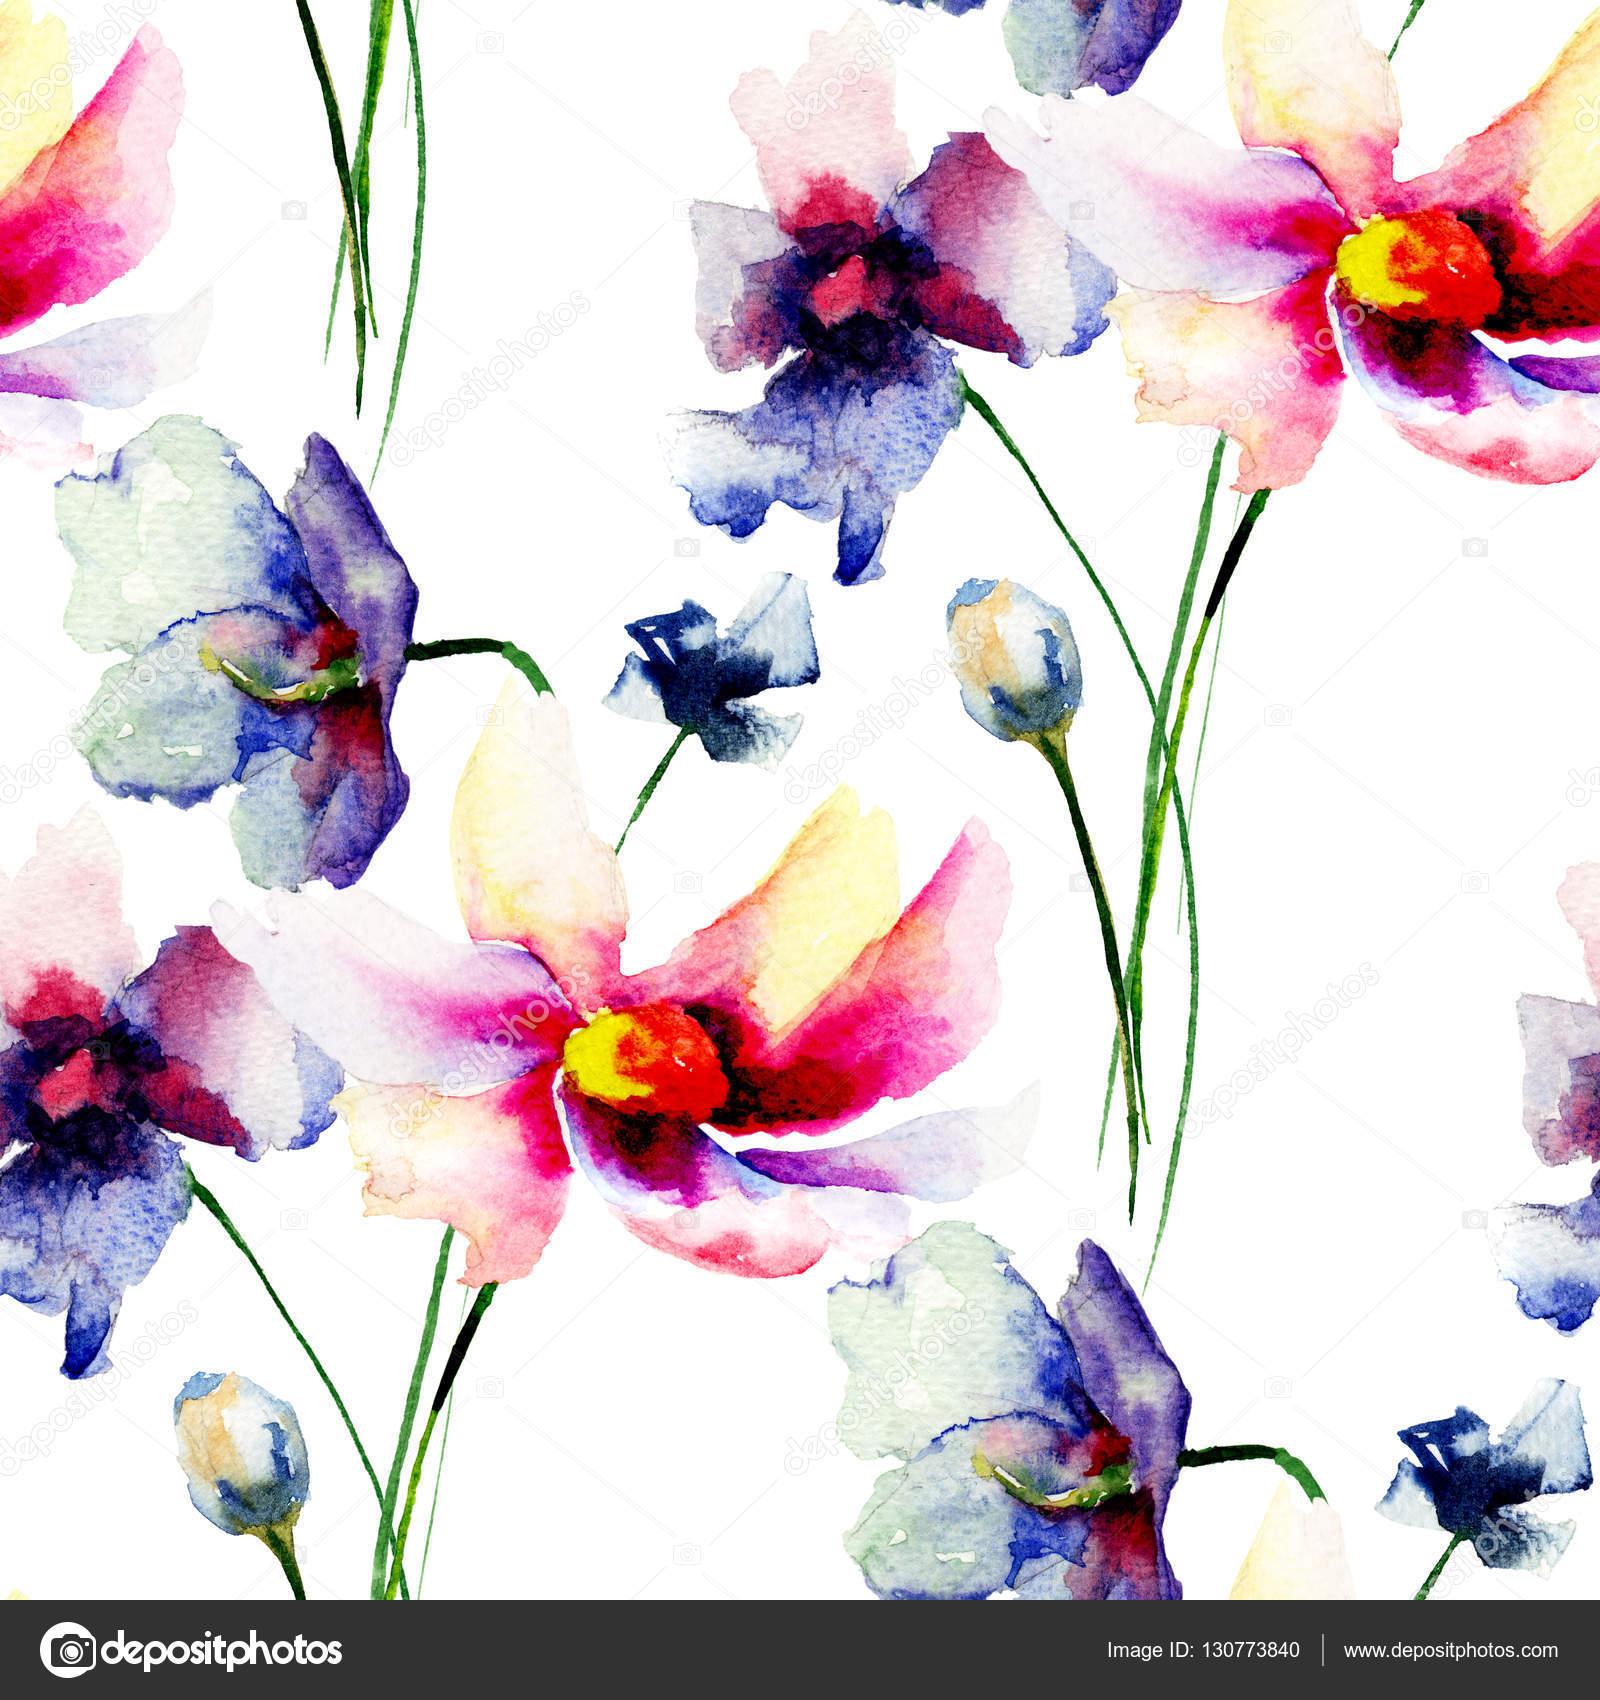 Fondos De Pantalla Transparentes Con Flores Decorativas